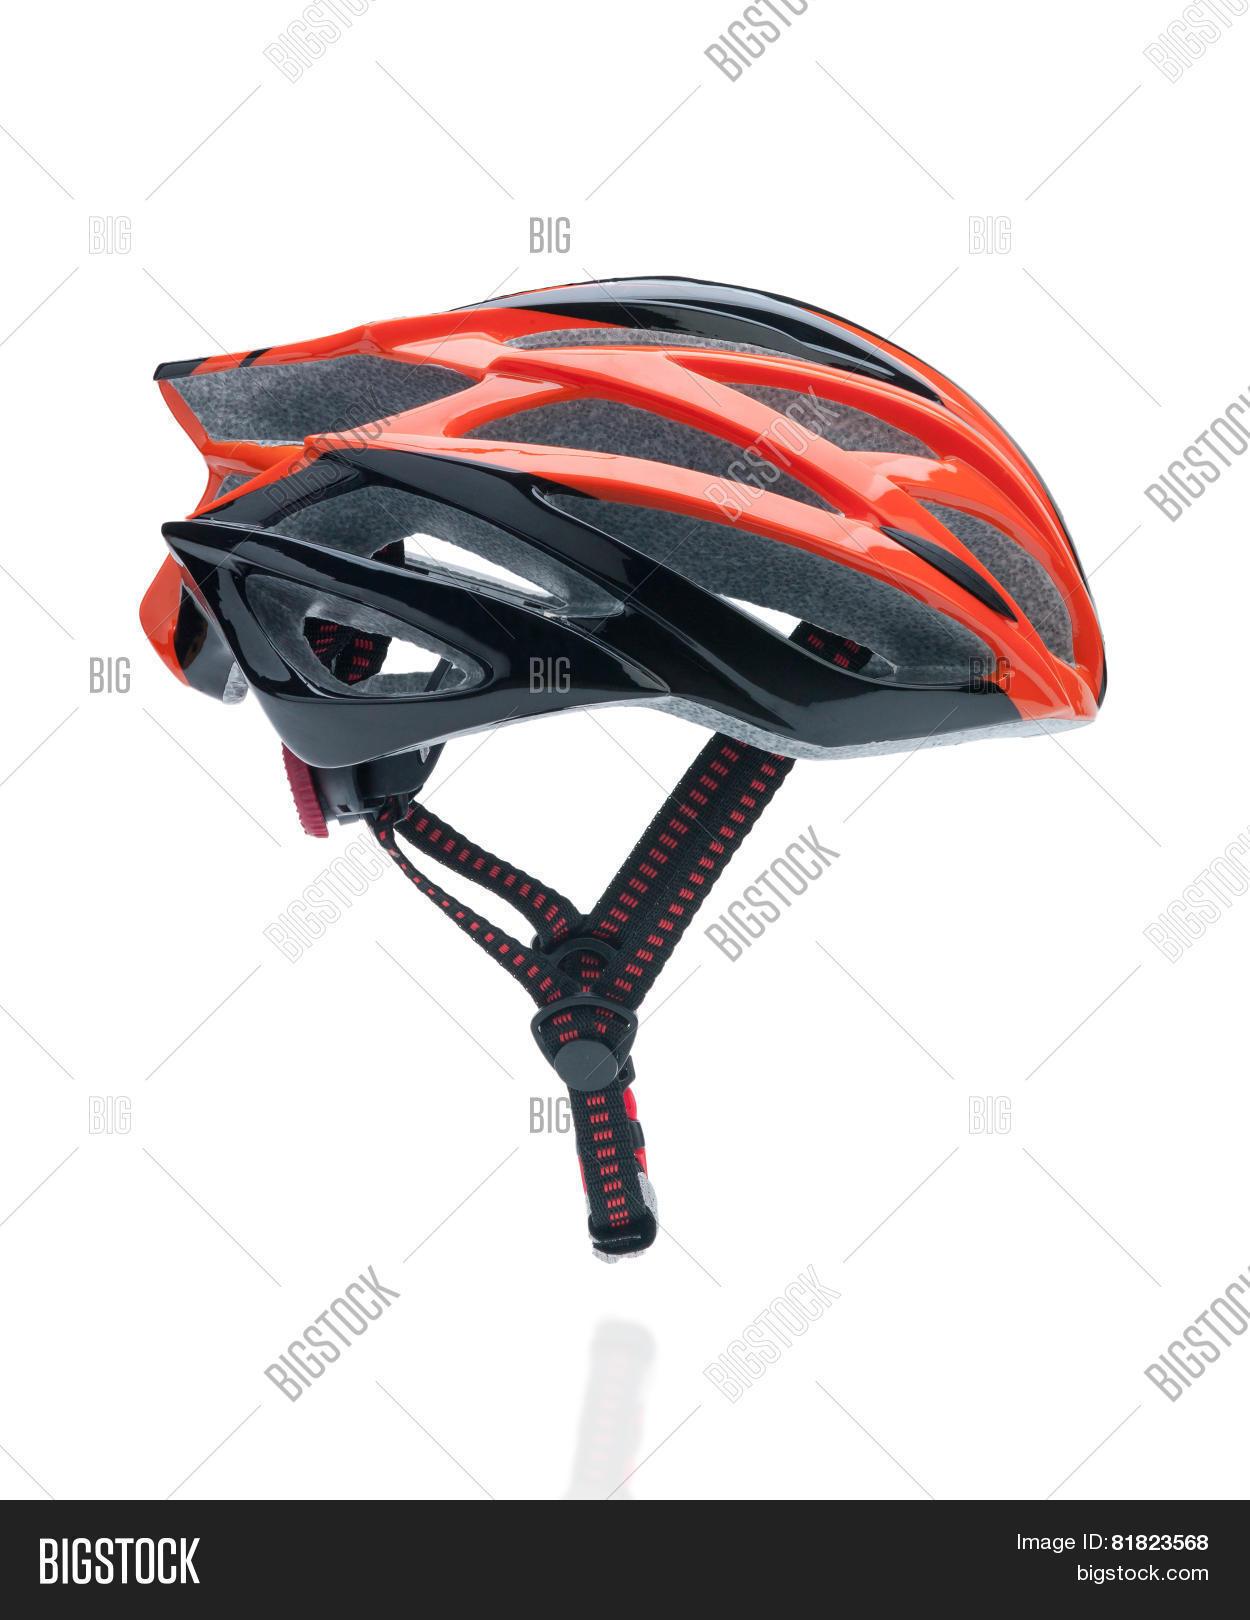 Bicycle Mountain Bike Safety Helmet Image Amp Photo